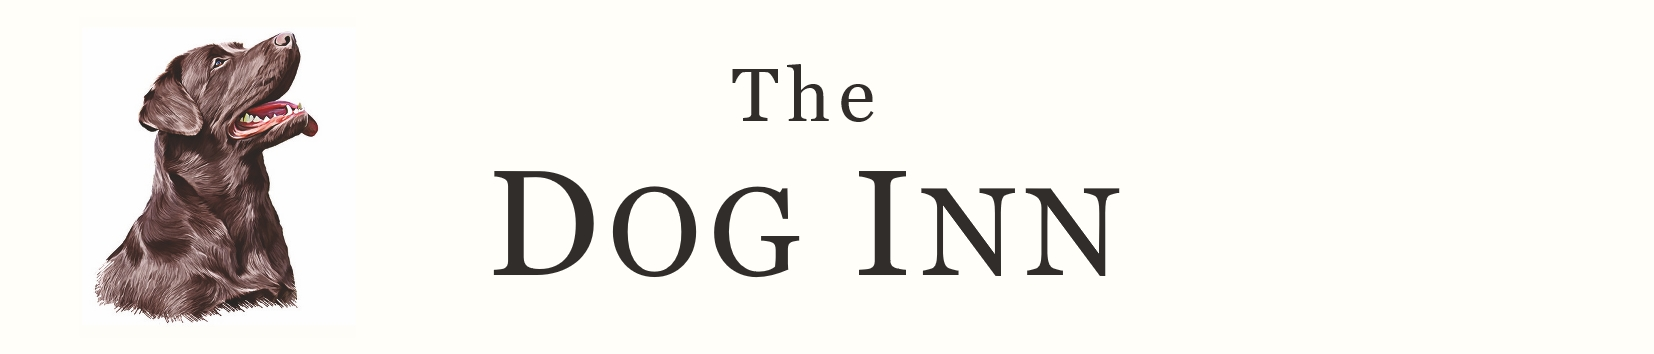 Dog Inn Old Sodbury